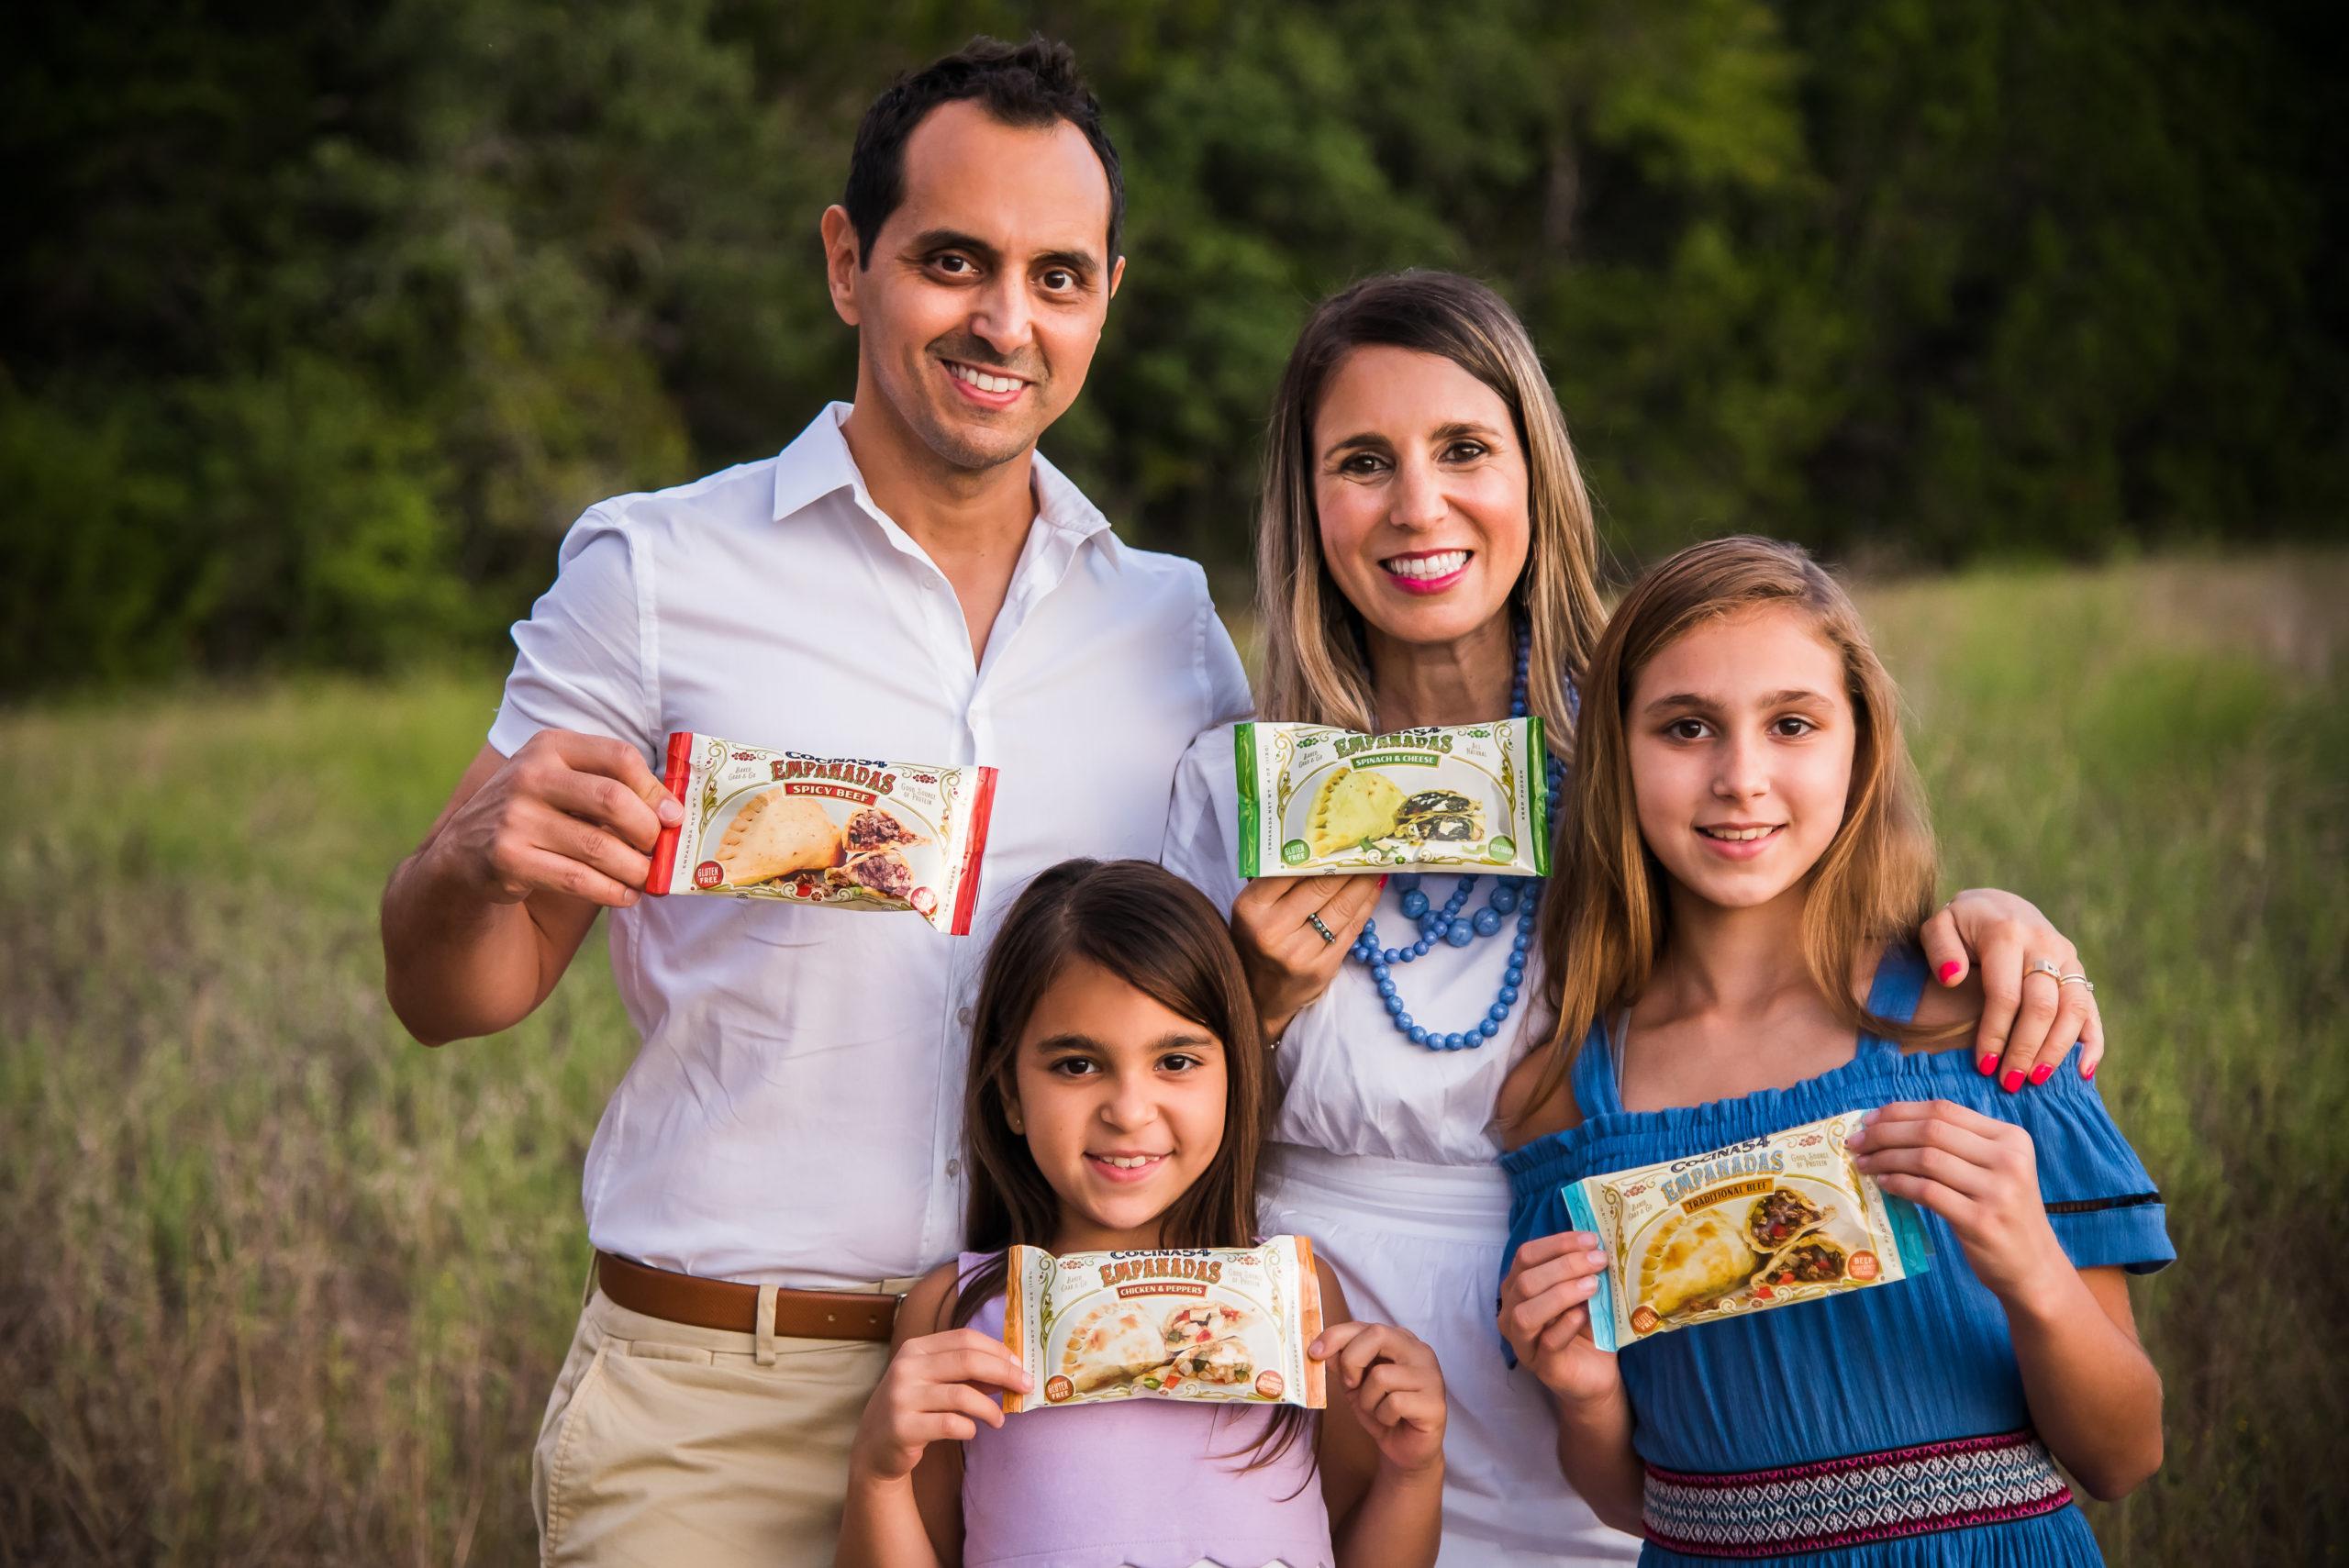 COCINA 54 is Bringing Latin American Flavors to Target's Freezer Aisle